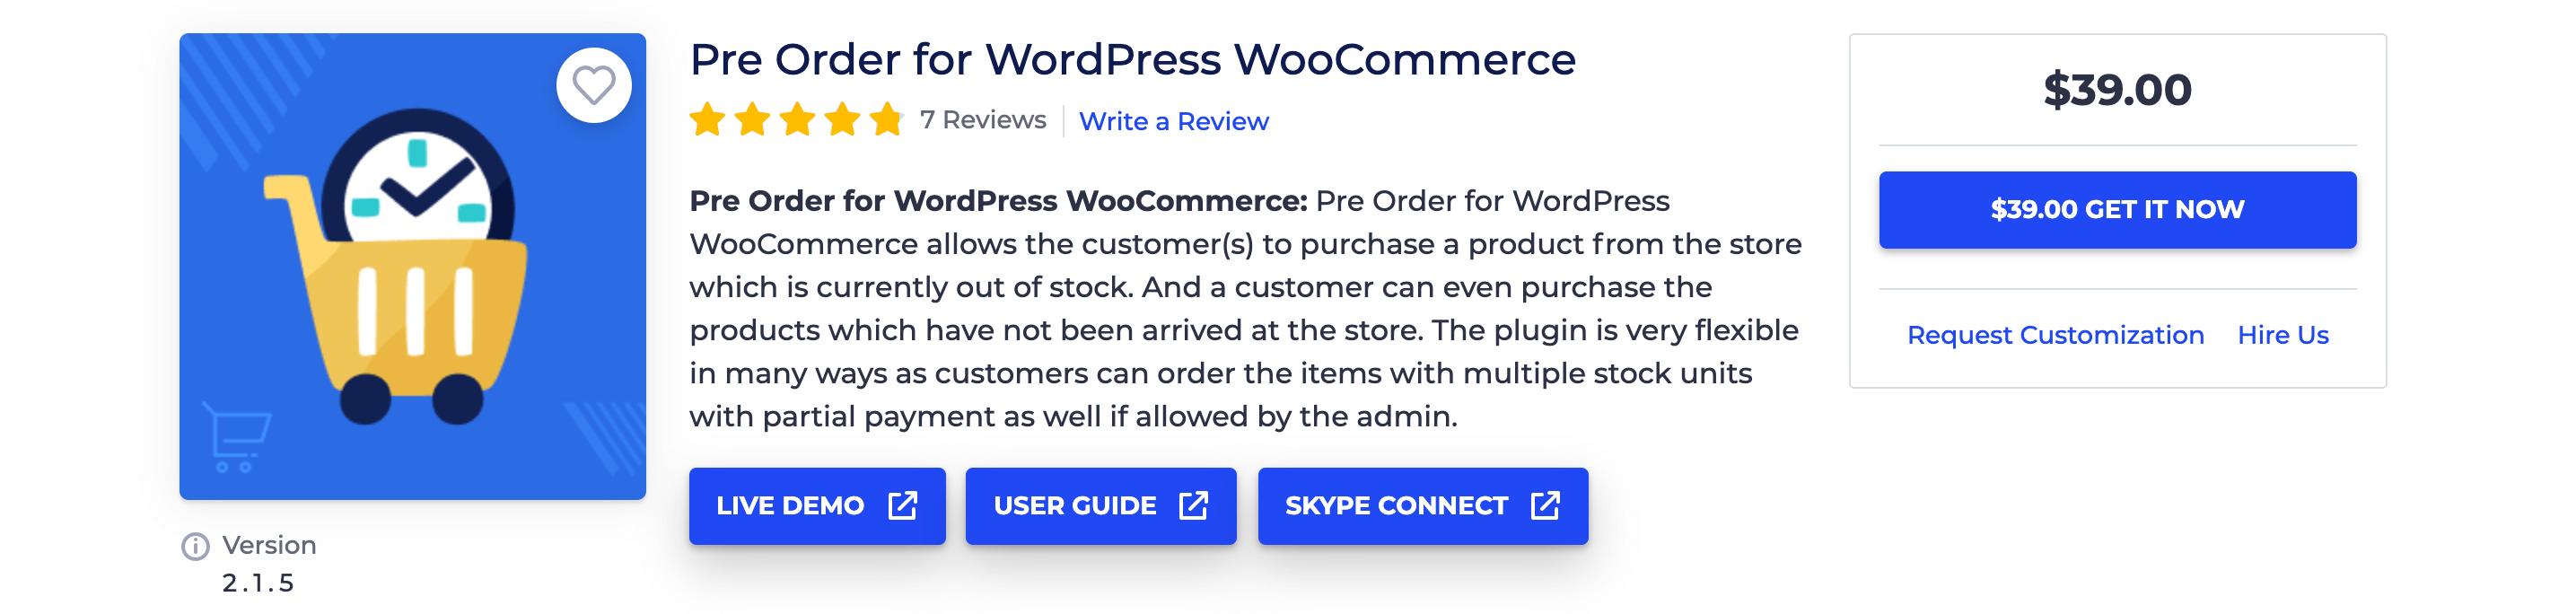 Pre Order for WordPress WooCommerce